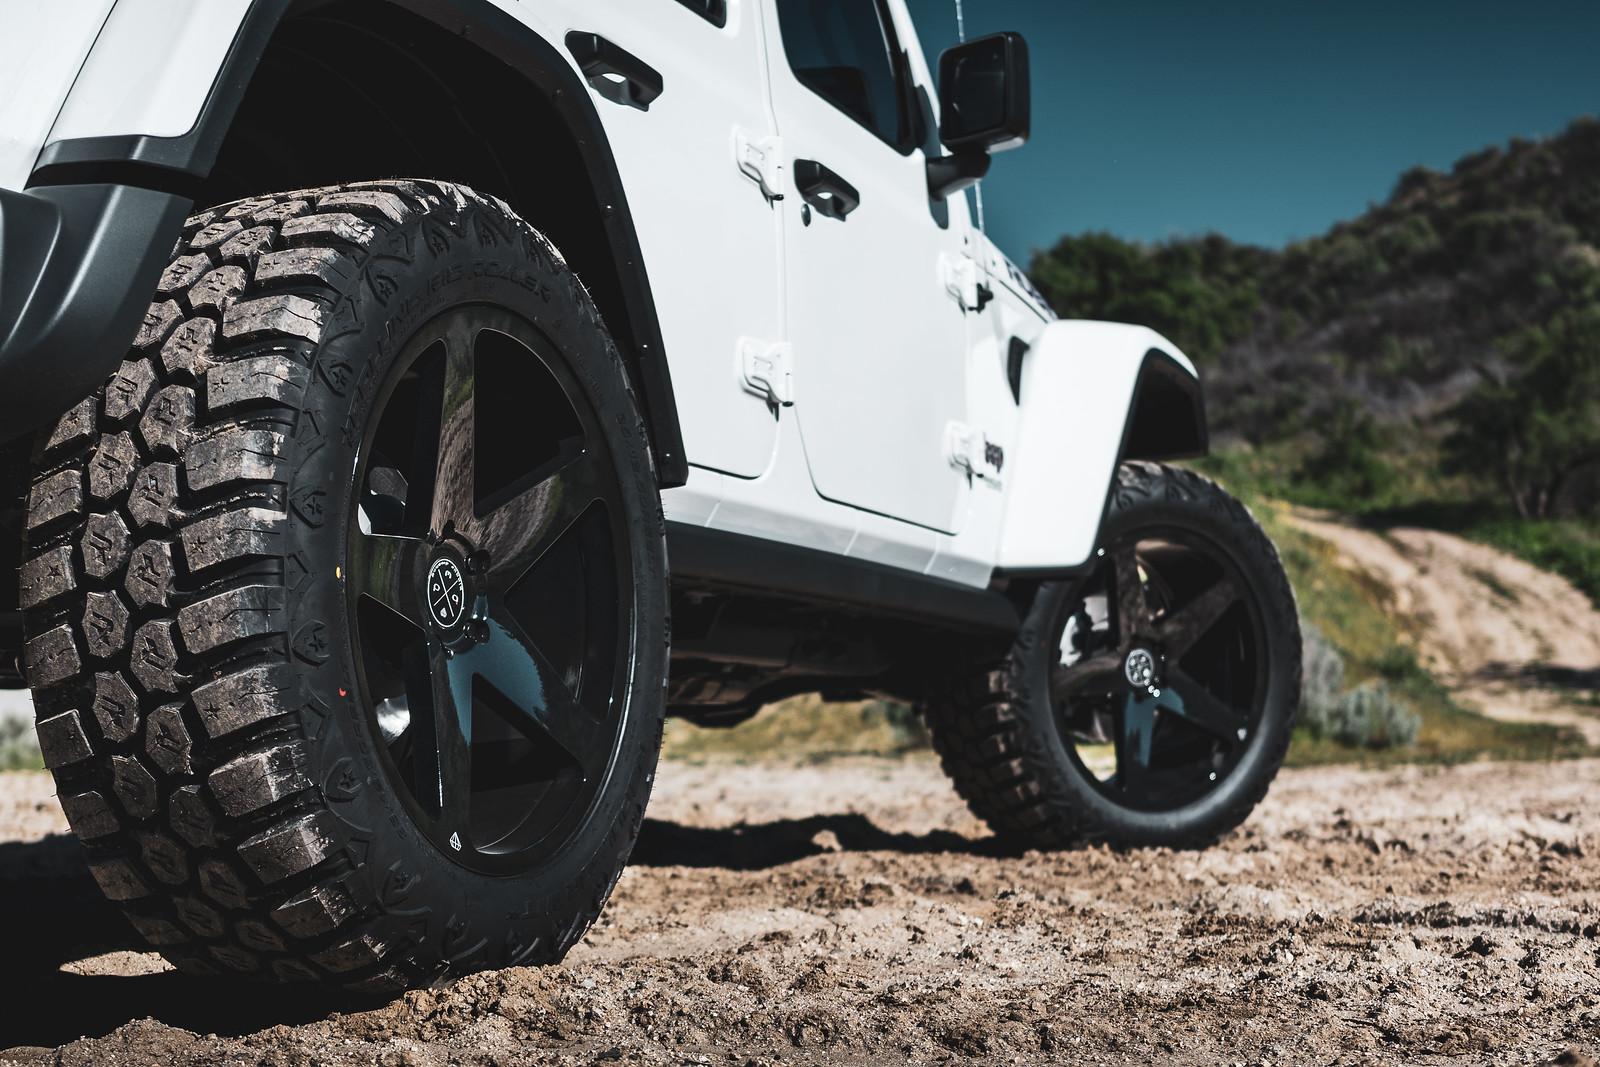 Jeep_Wrangler_BD15_GlossBlack-13